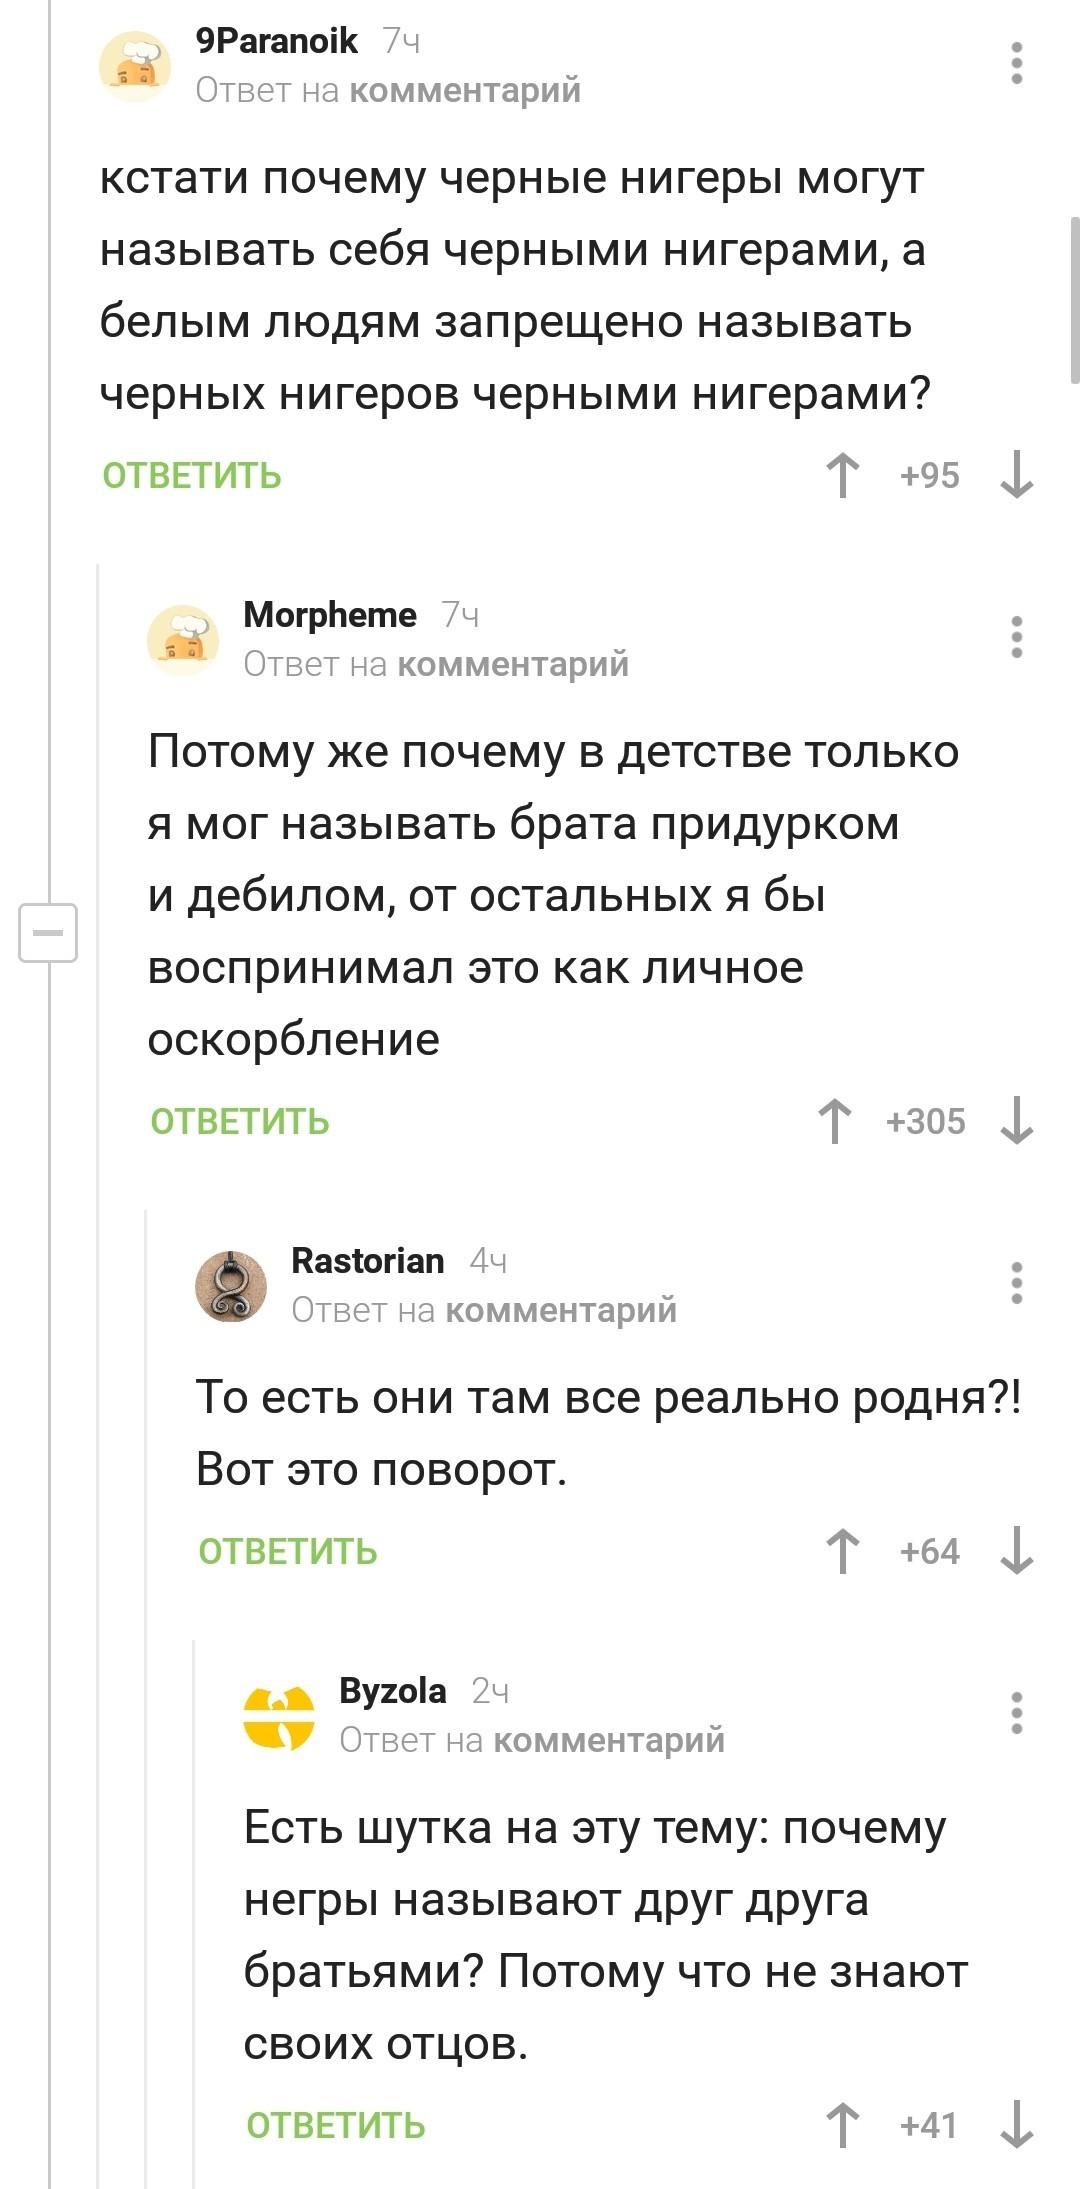 Коментарии о неграх